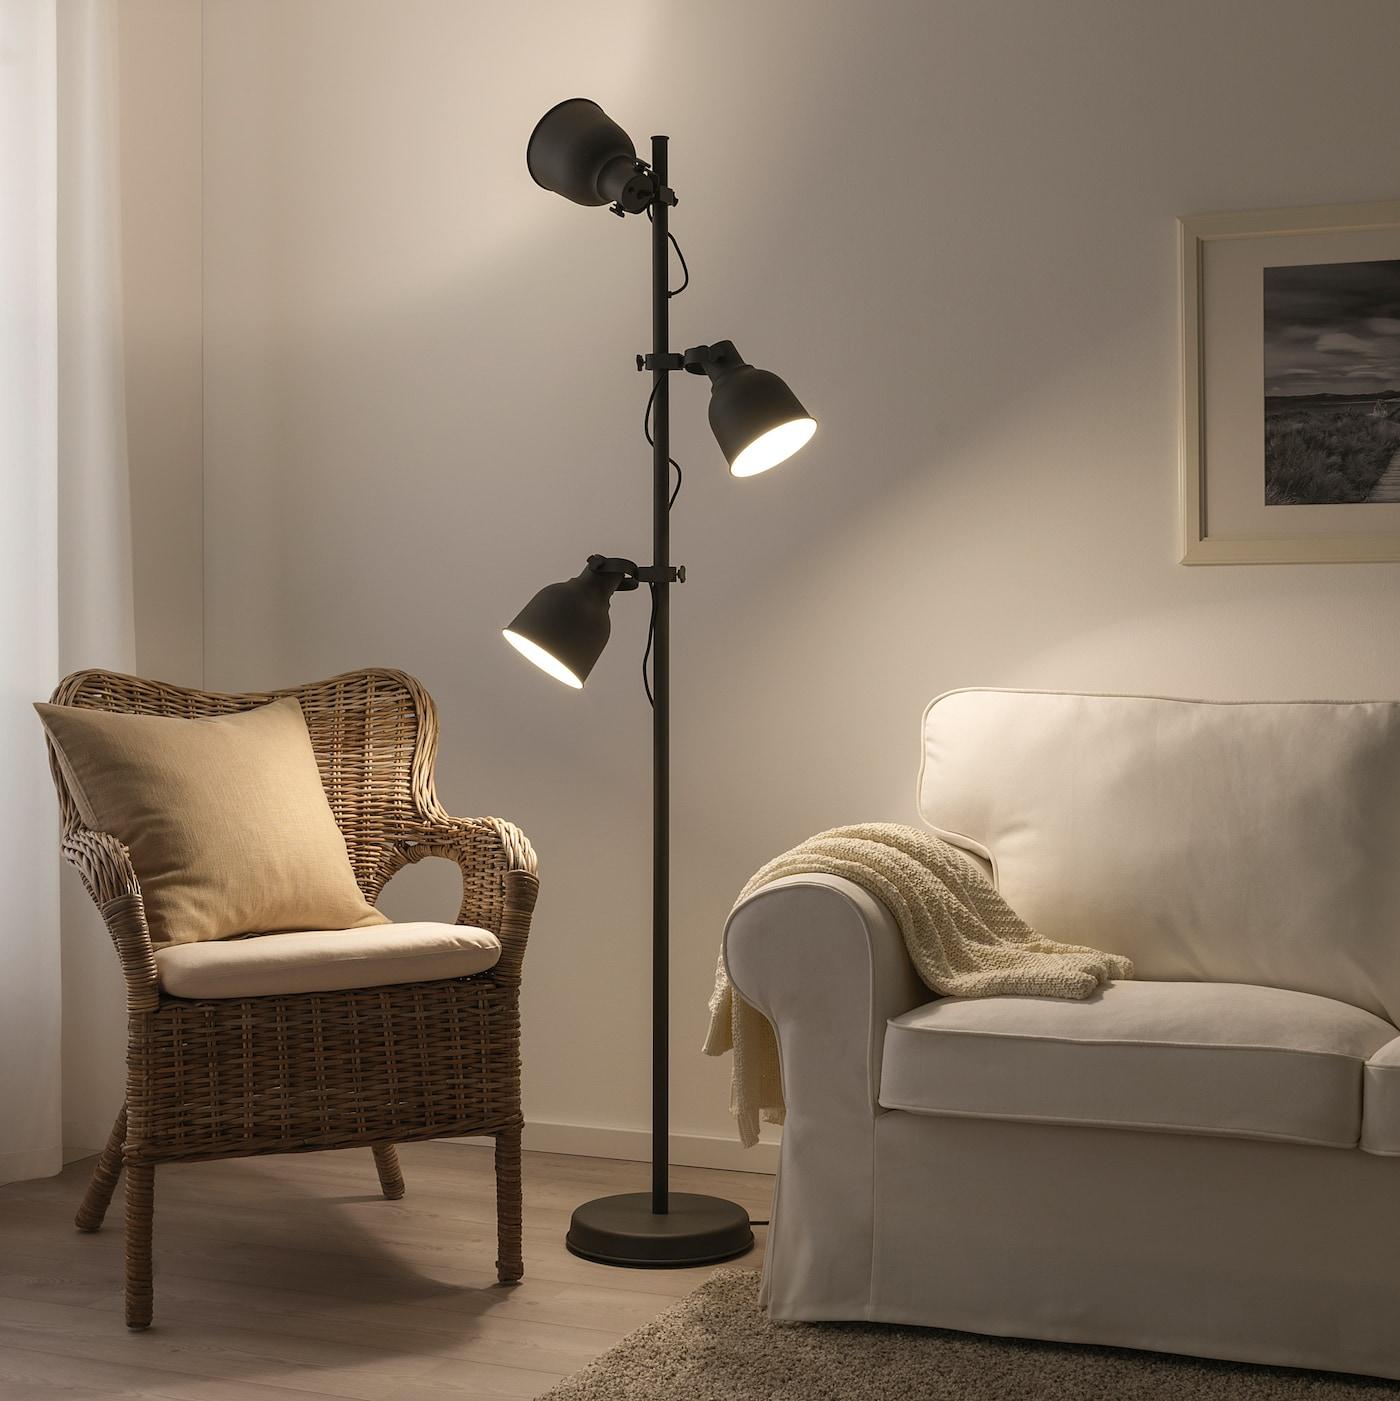 HEKTAR dark grey, Floor lamp with 3